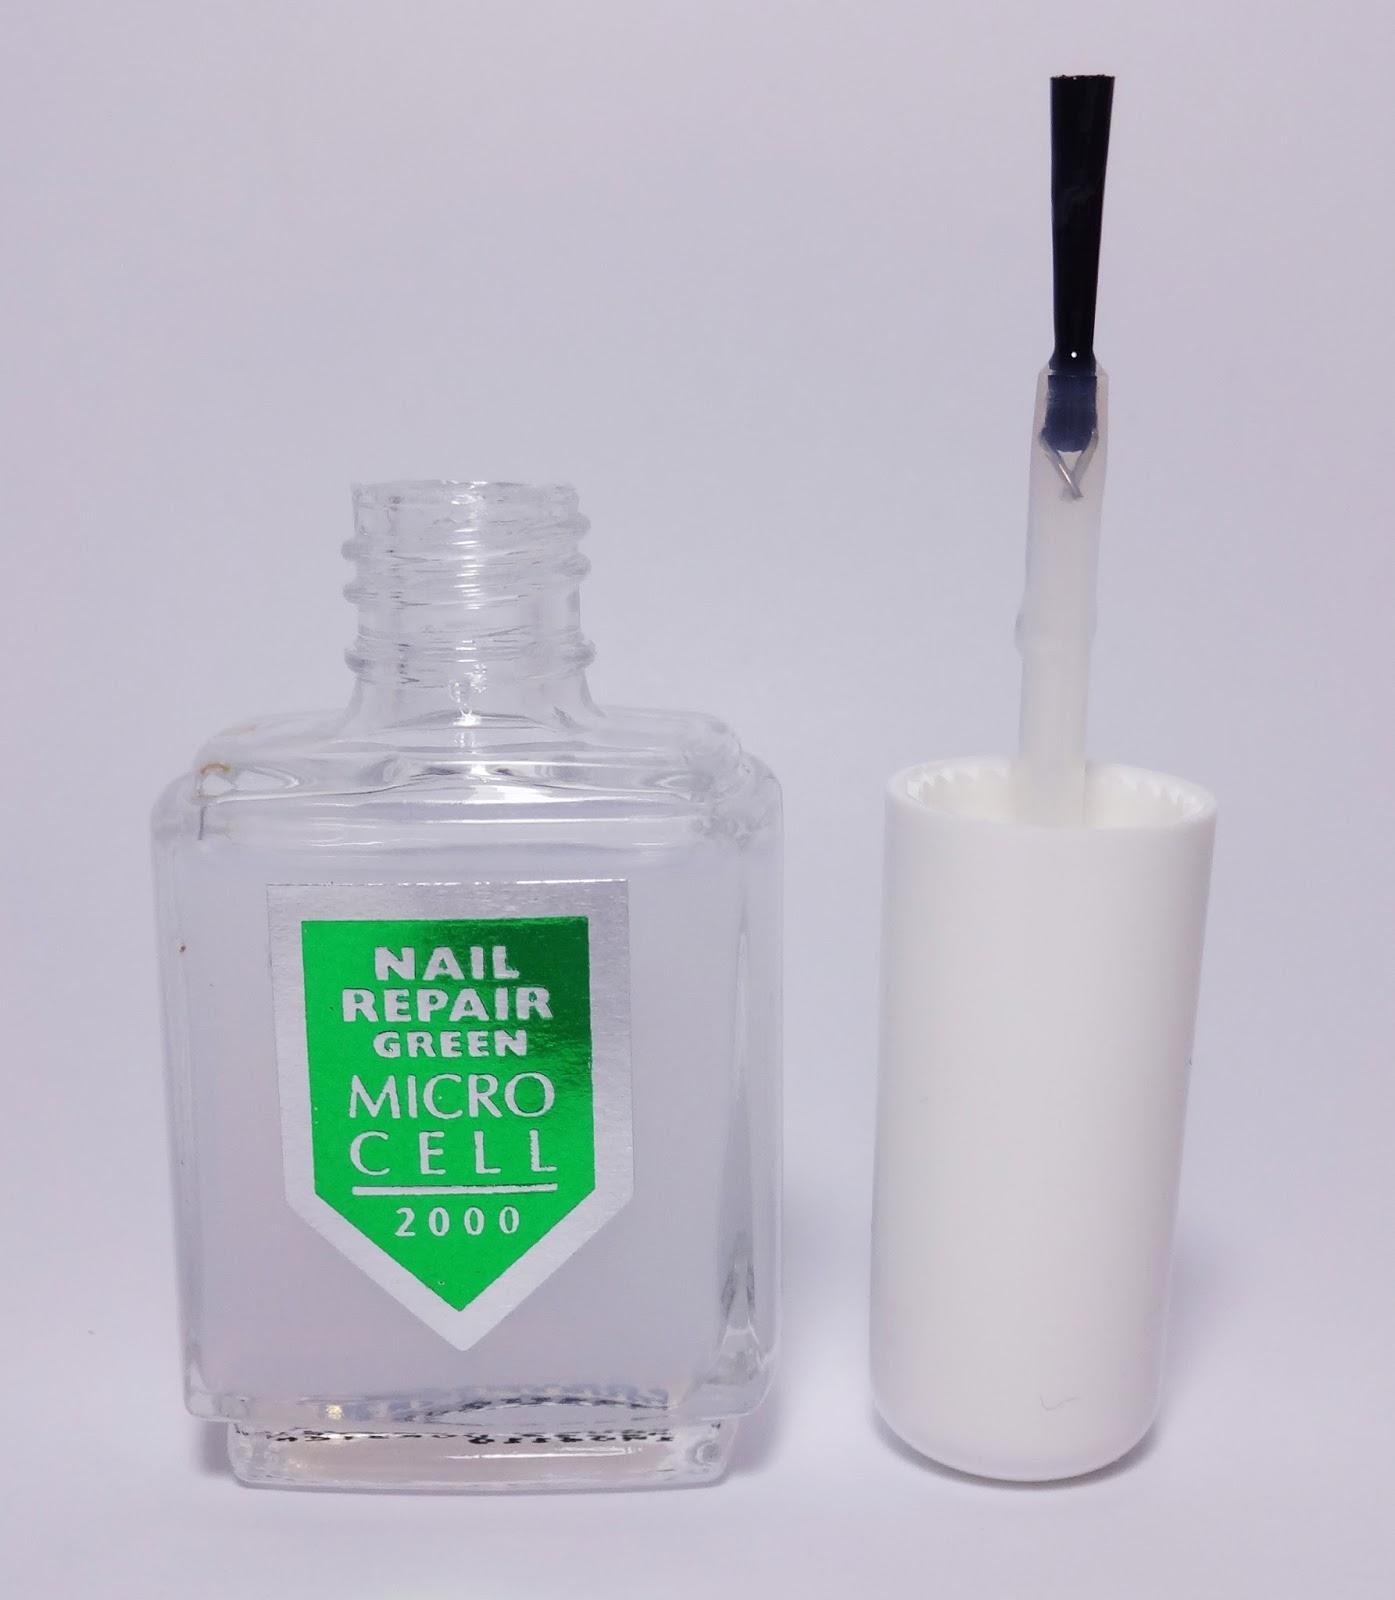 Micro Cell 2000 - Nail Repair GREEN